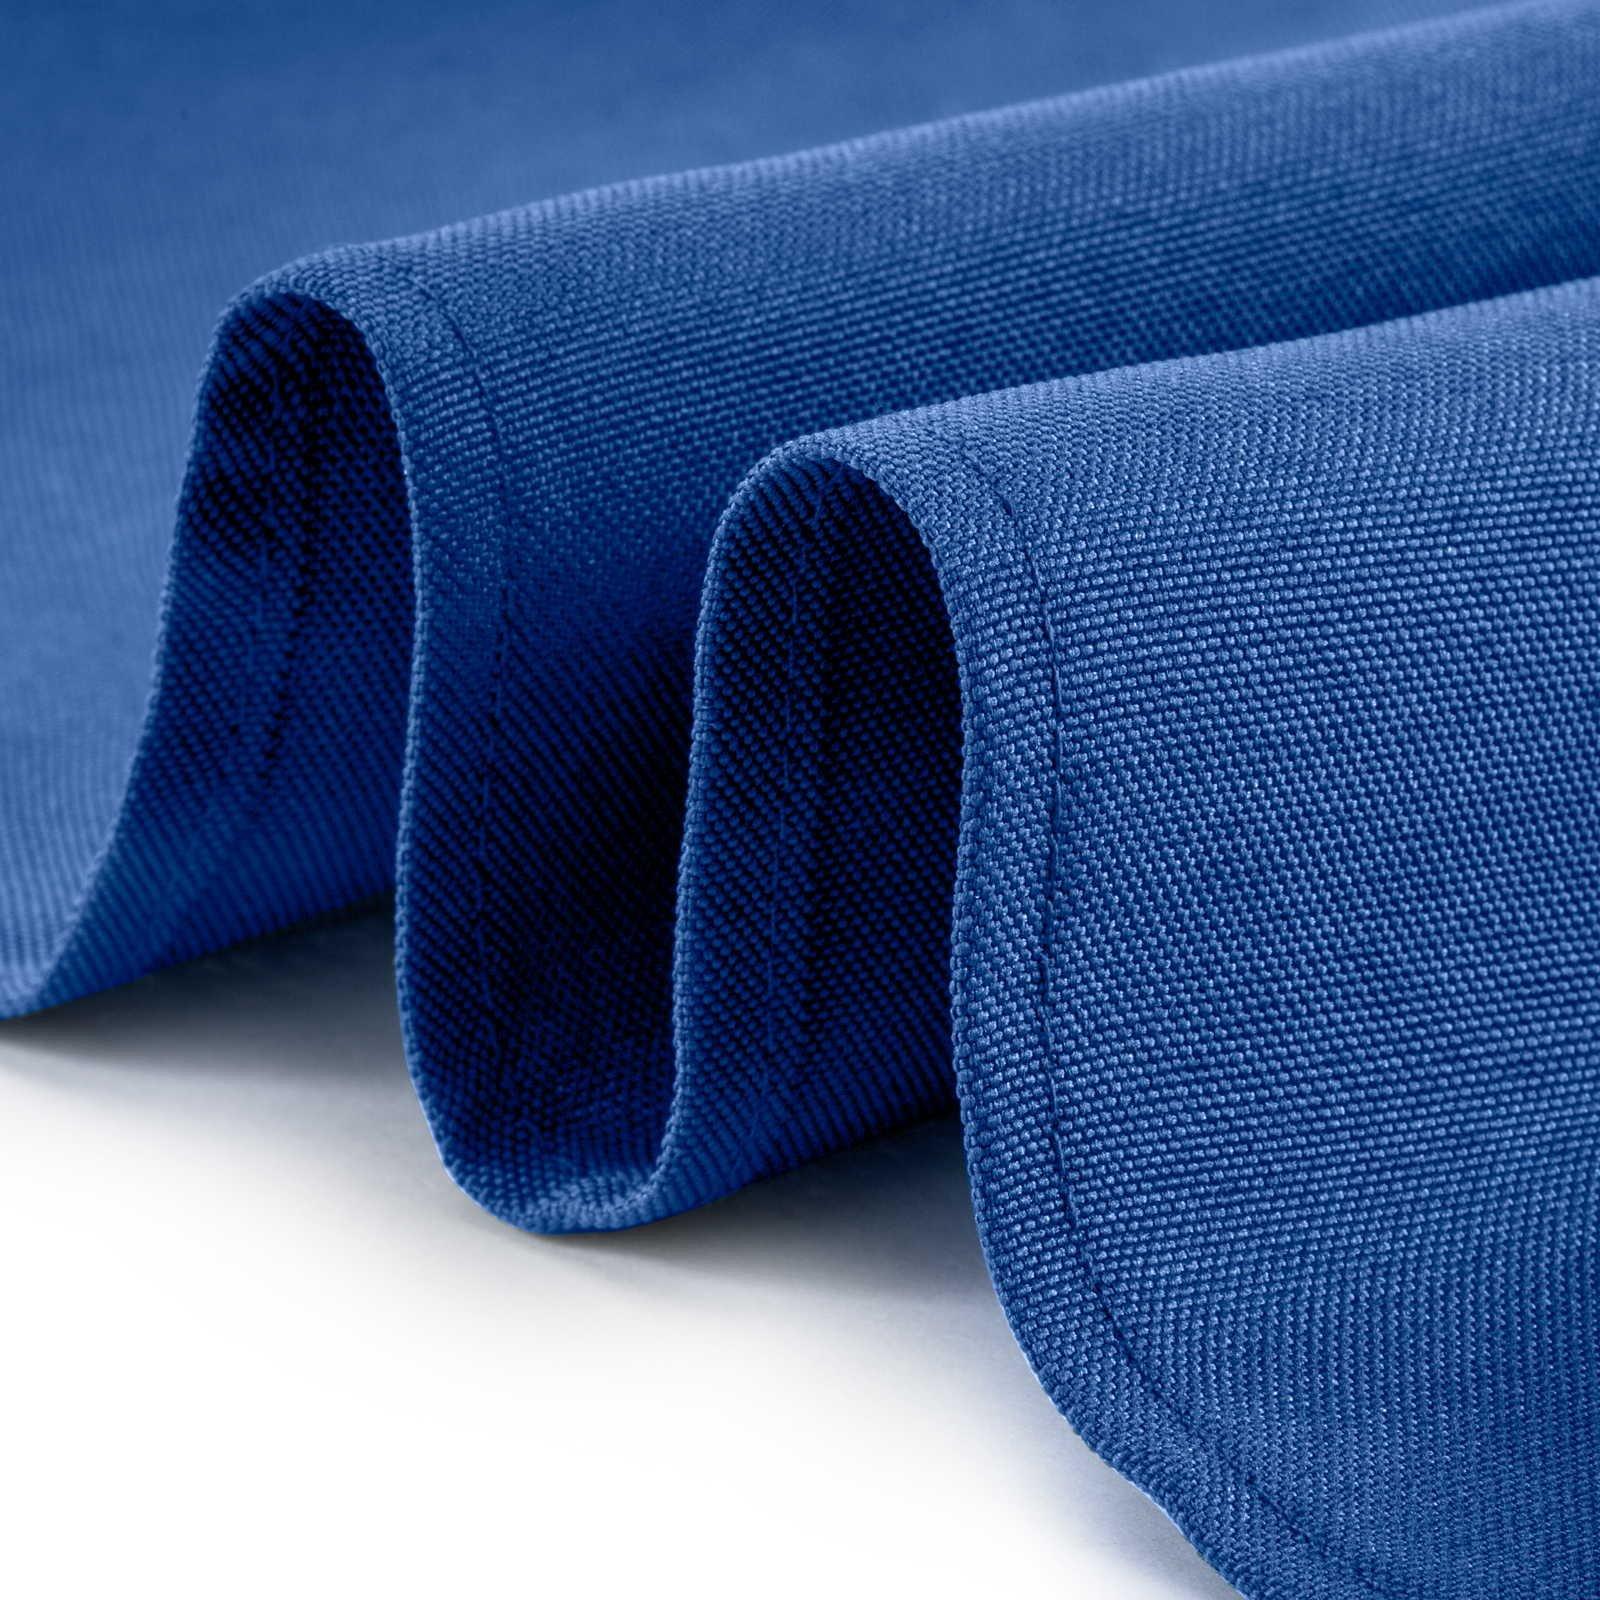 Lann's Linens - 1 Dozen 17'' Cloth Dinner Table Napkins - Machine Washable Restaurant/Wedding/Hotel Quality Polyester Fabric - Royal Blue by Lann's Linens (Image #2)